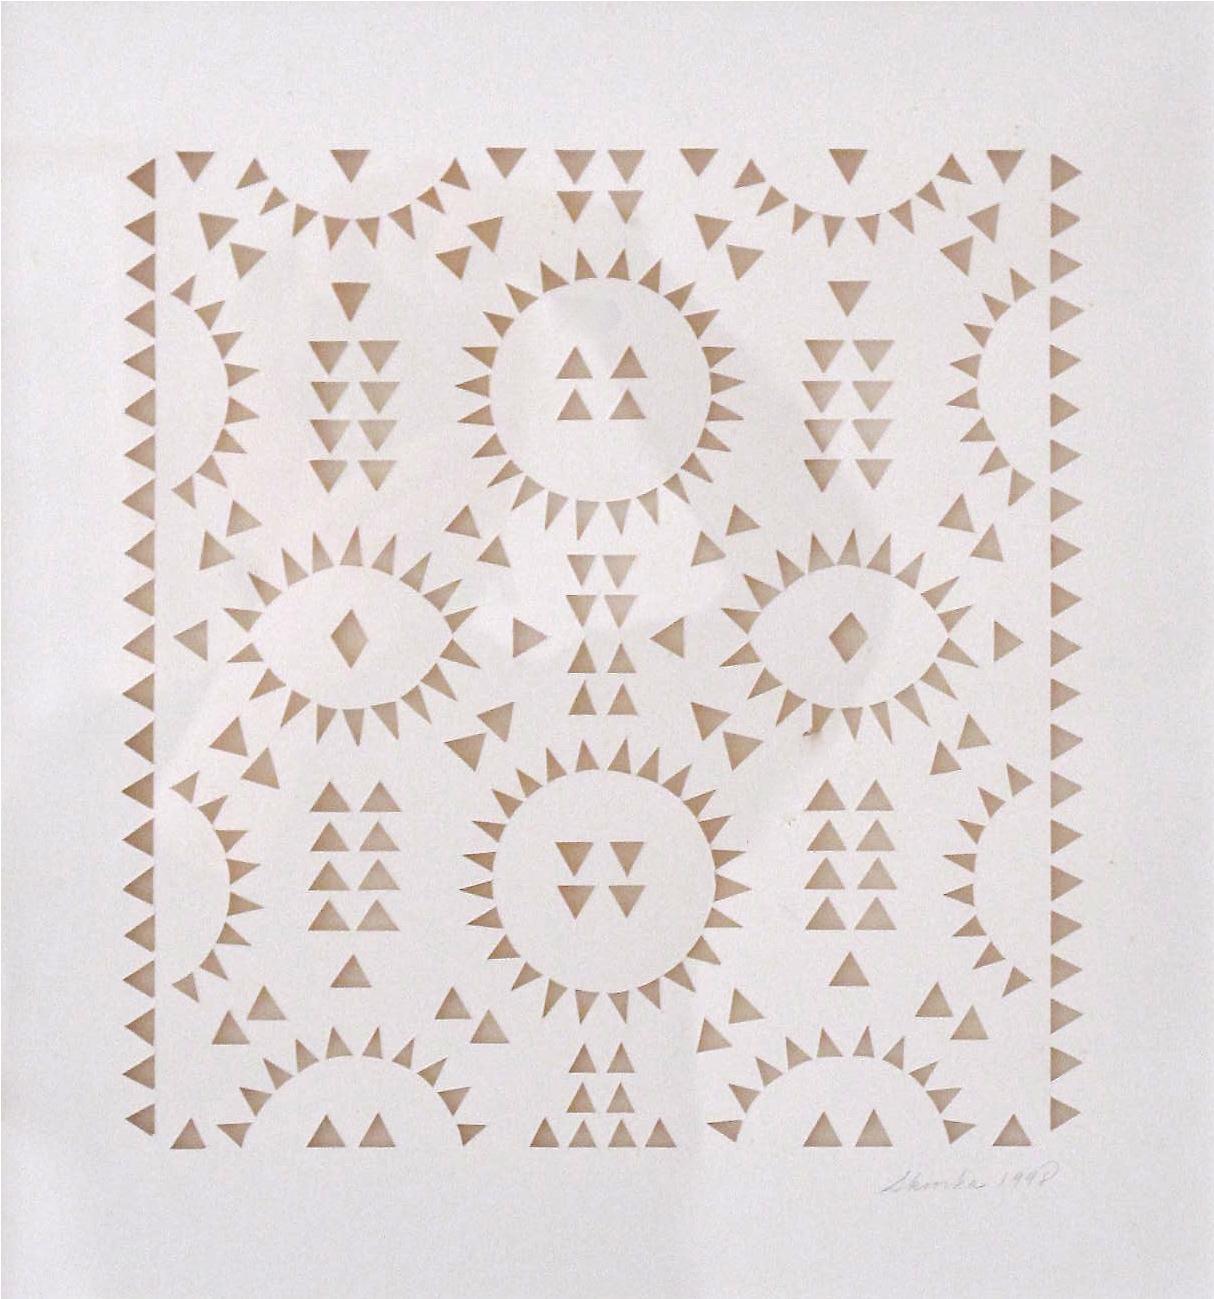 Susan Skoorka, Triangles 1